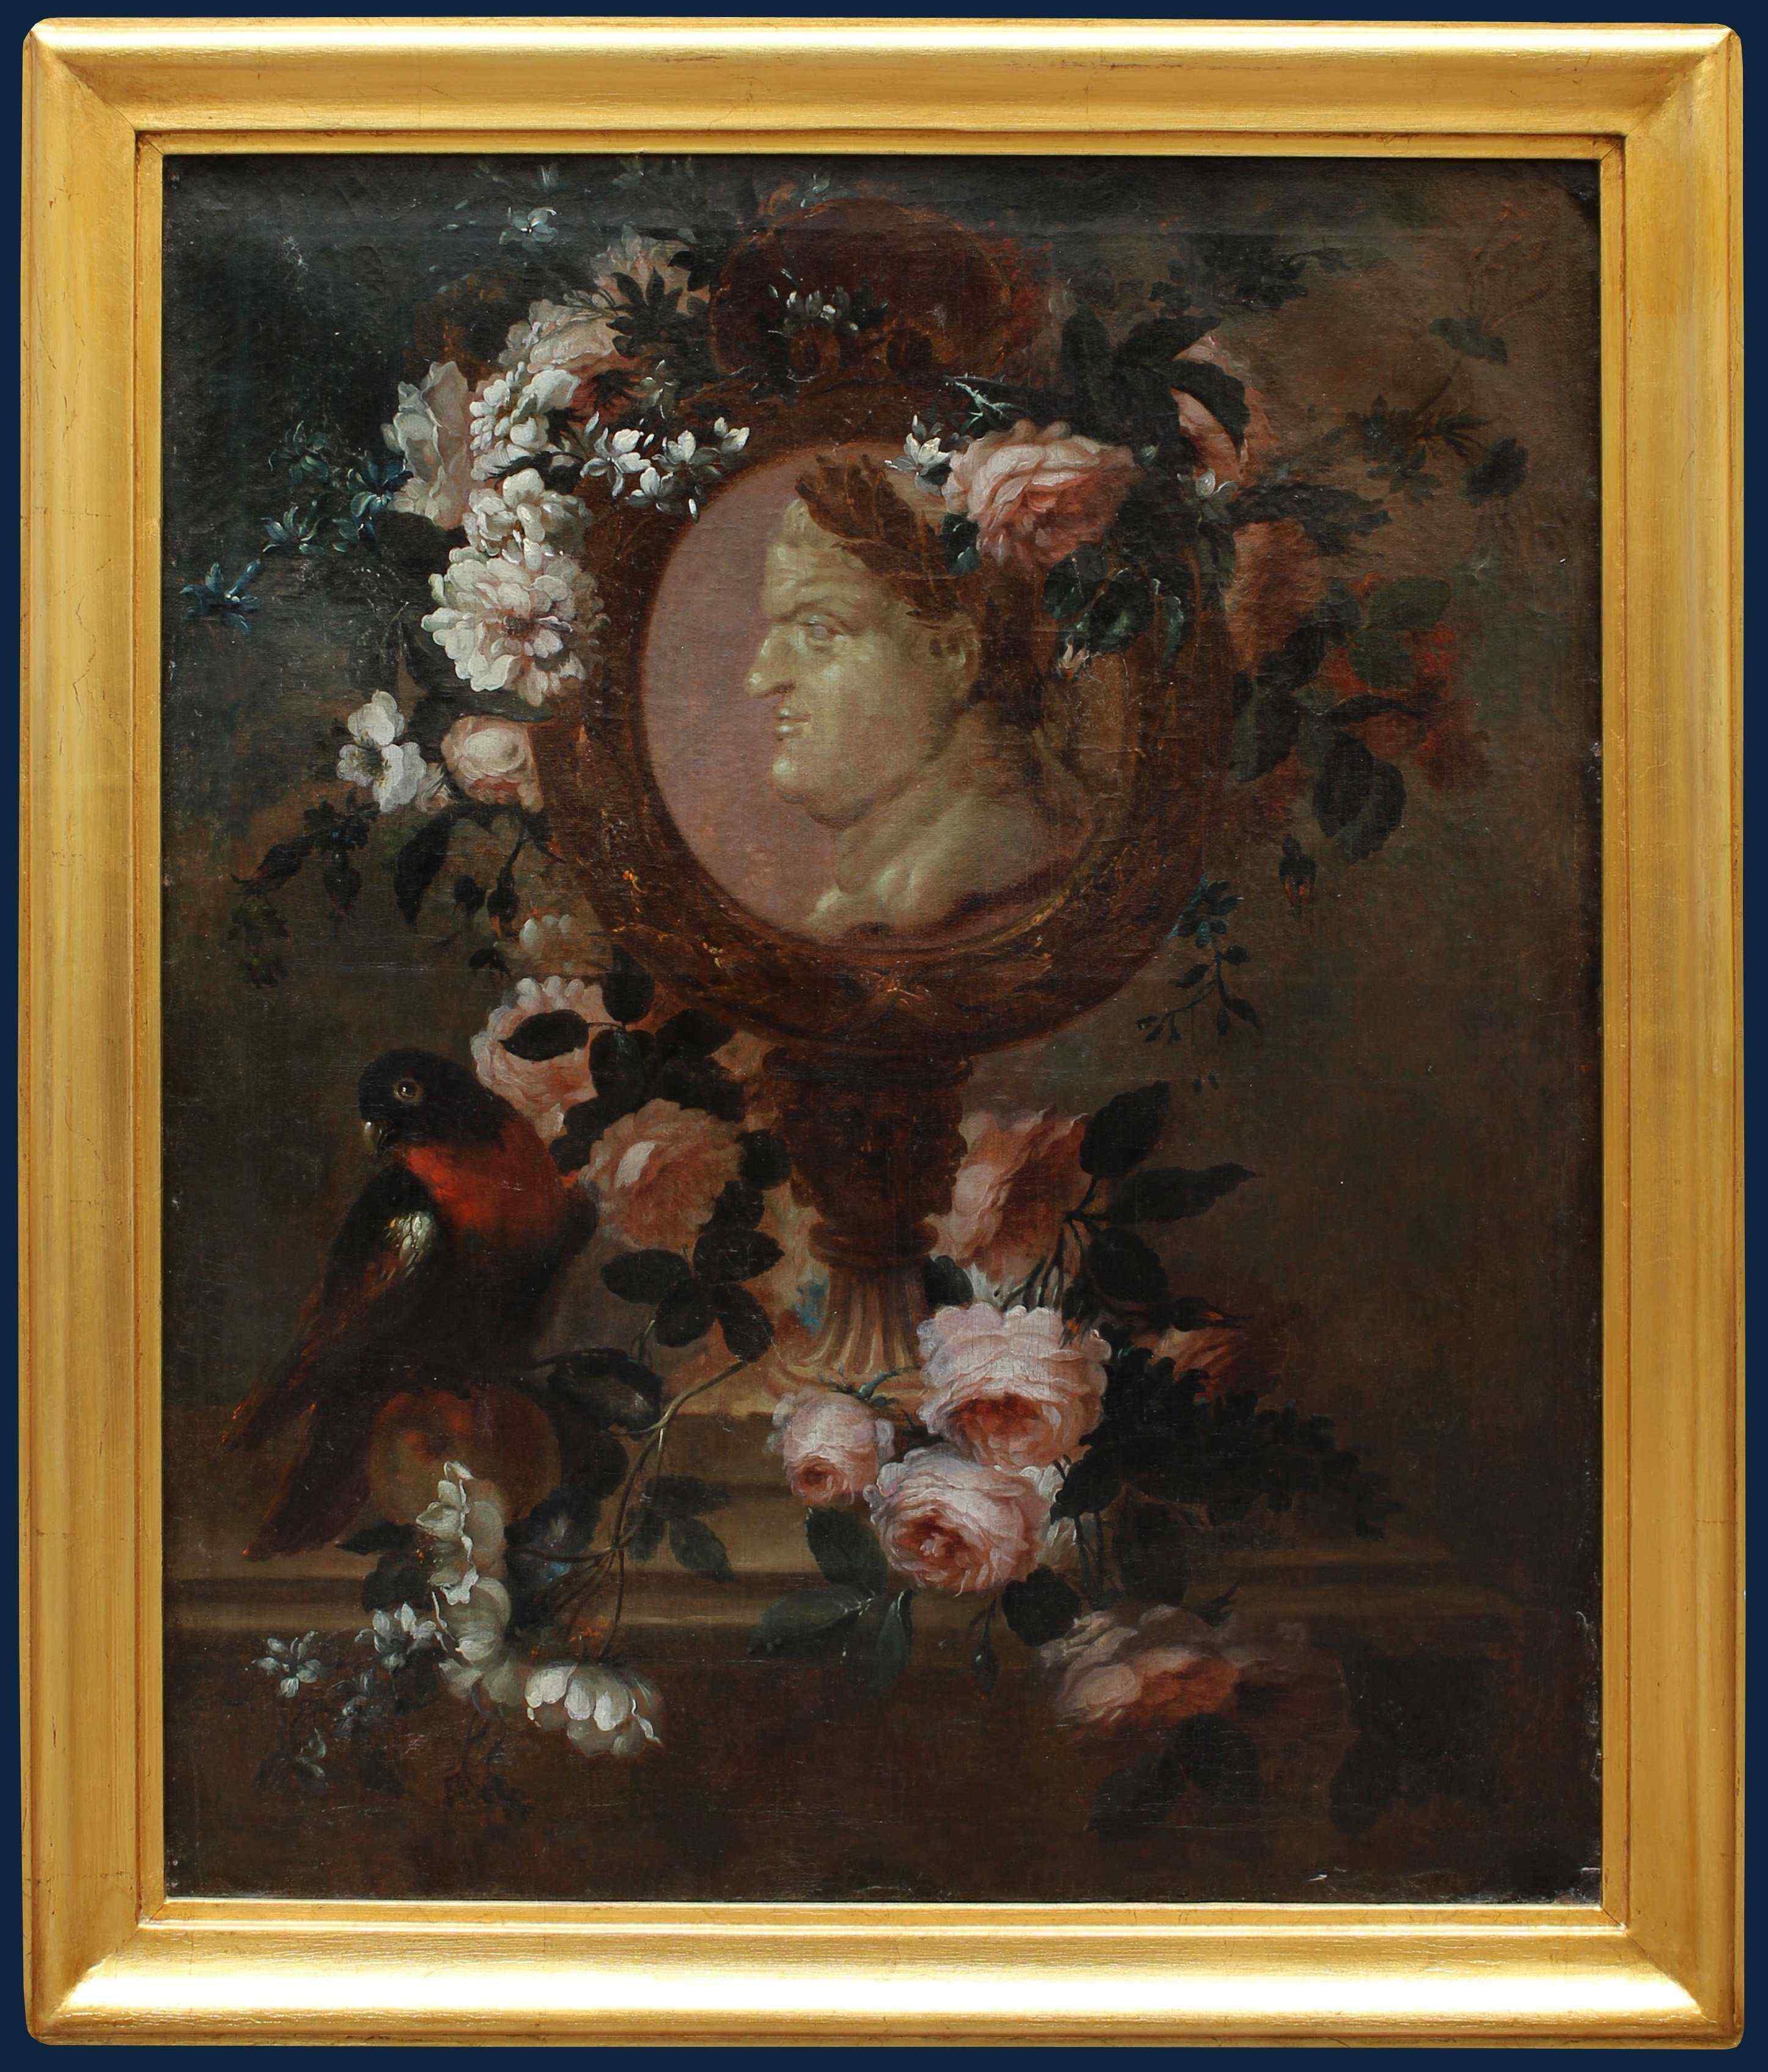 Франция, XVIII век натюрморт Холст, масло